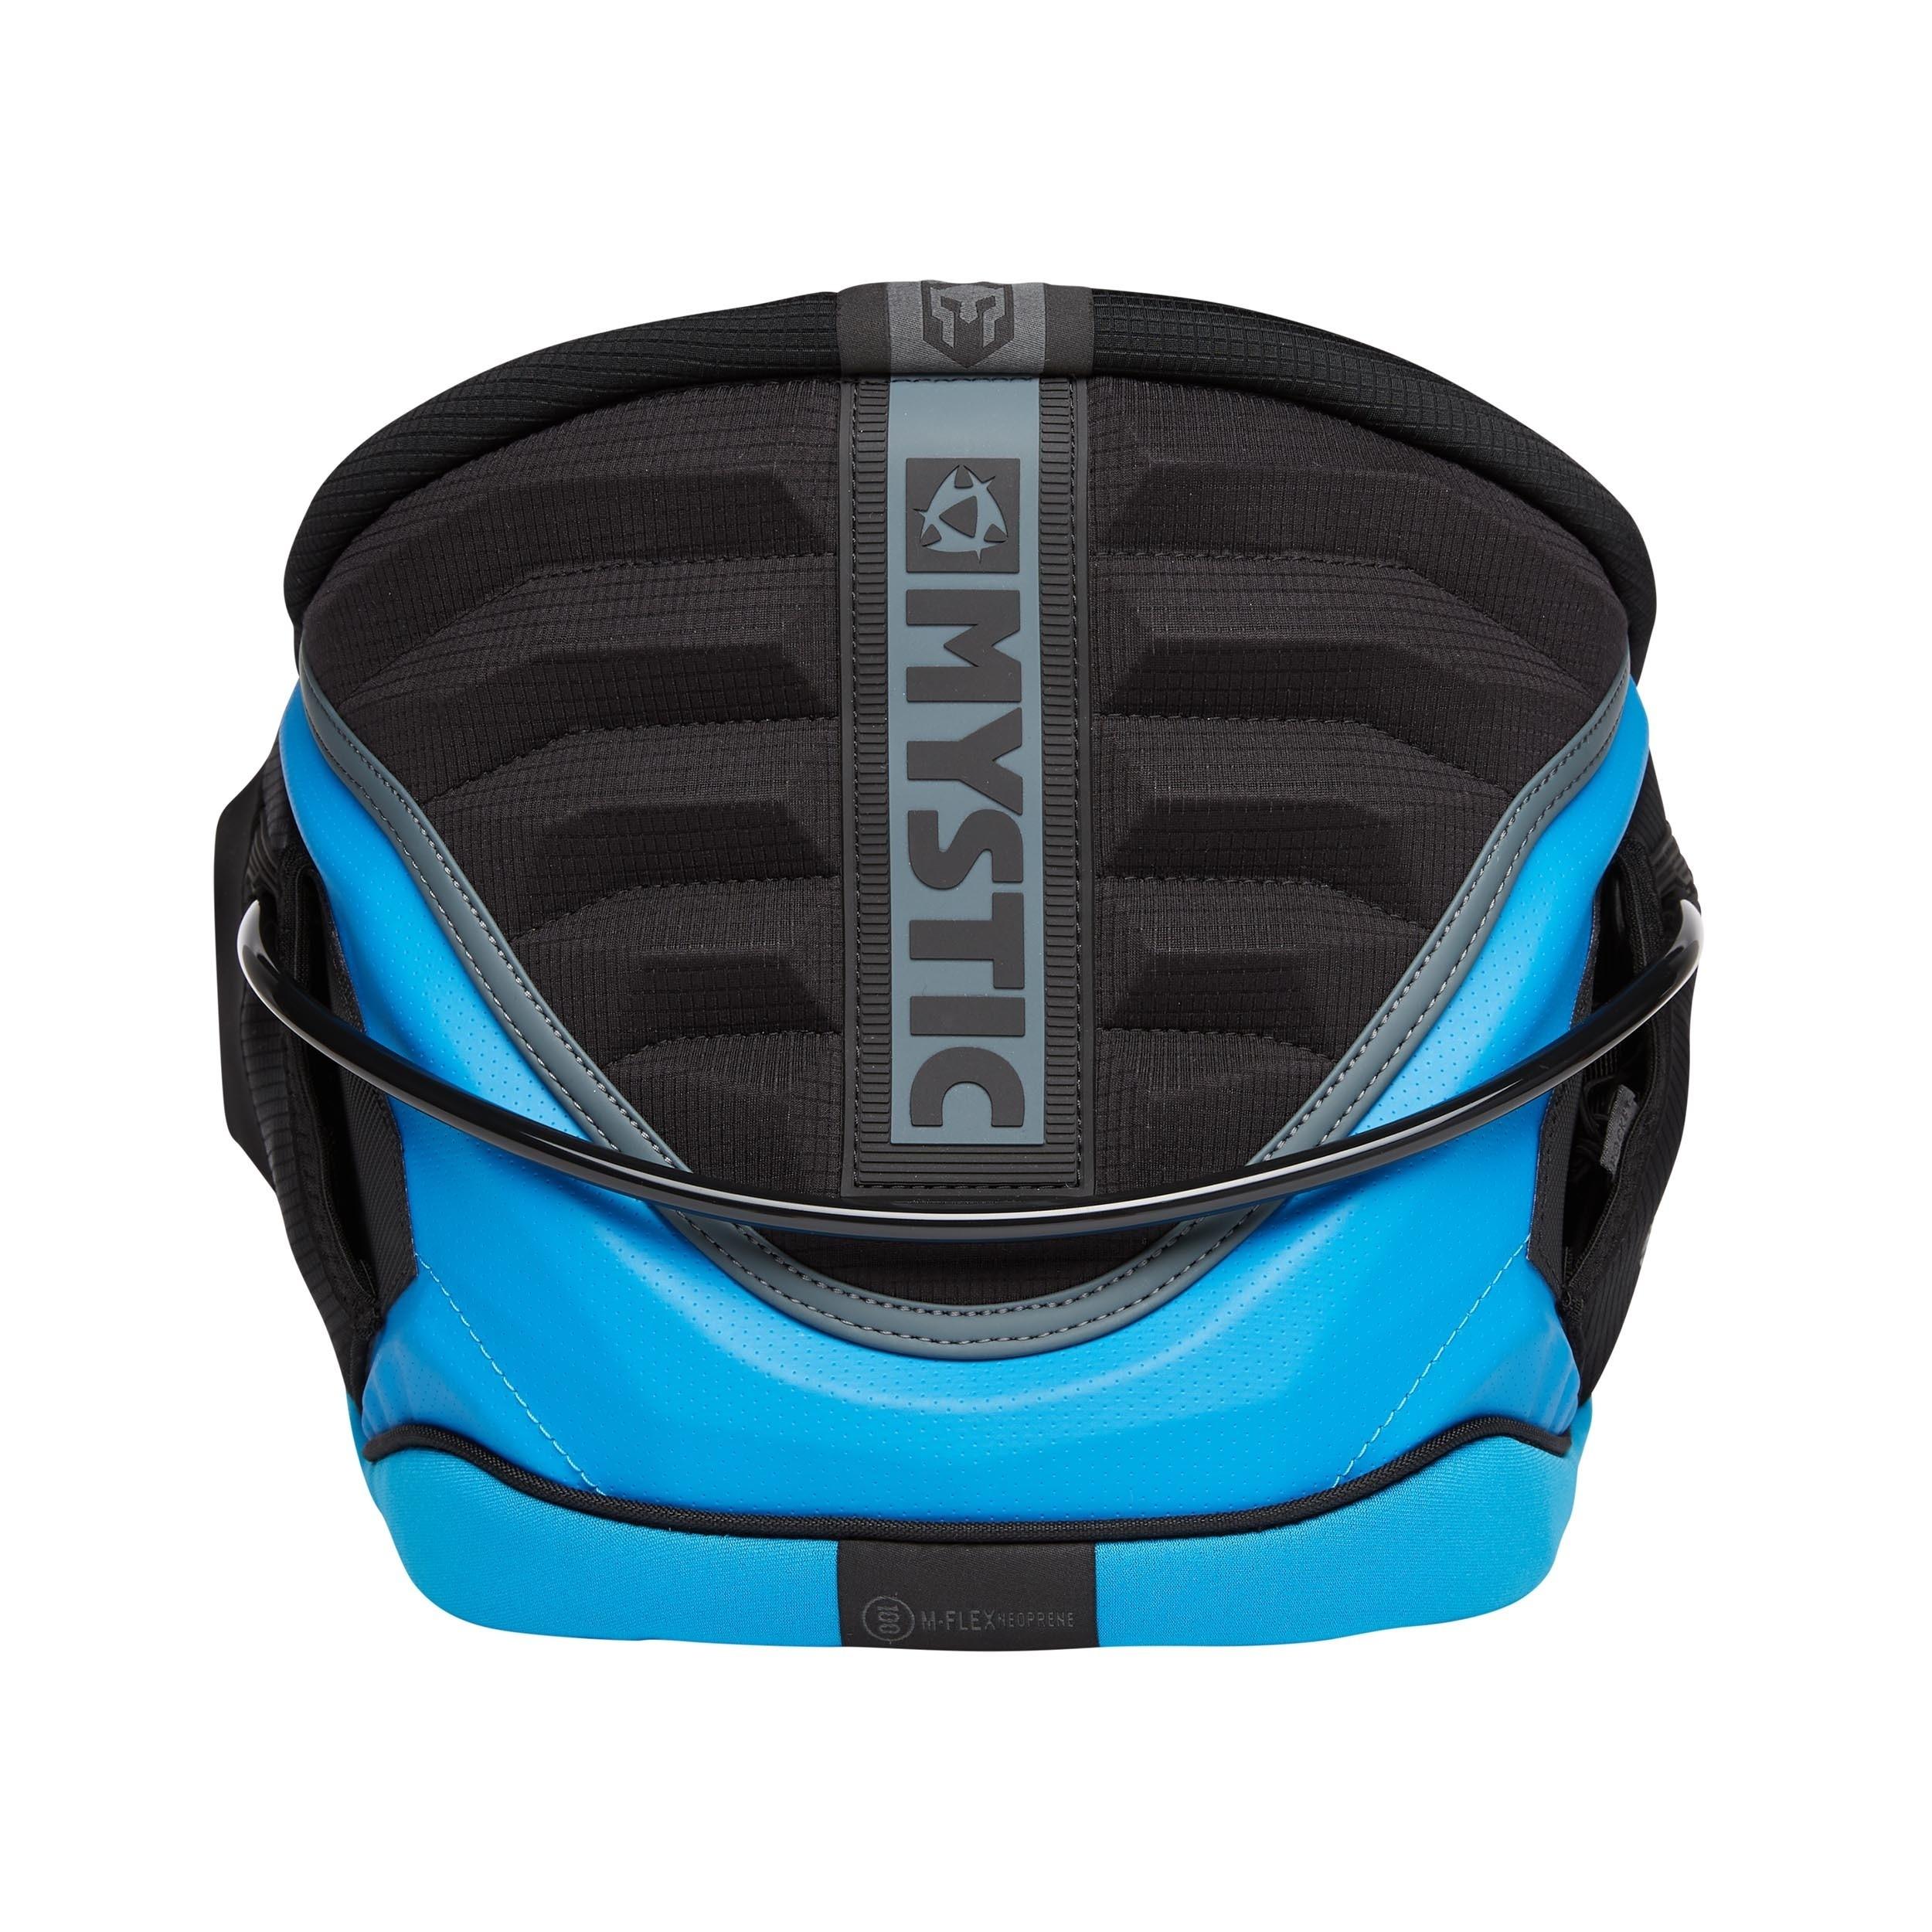 Mystic Warrior V1 Kitesurf Waist Harness Blue